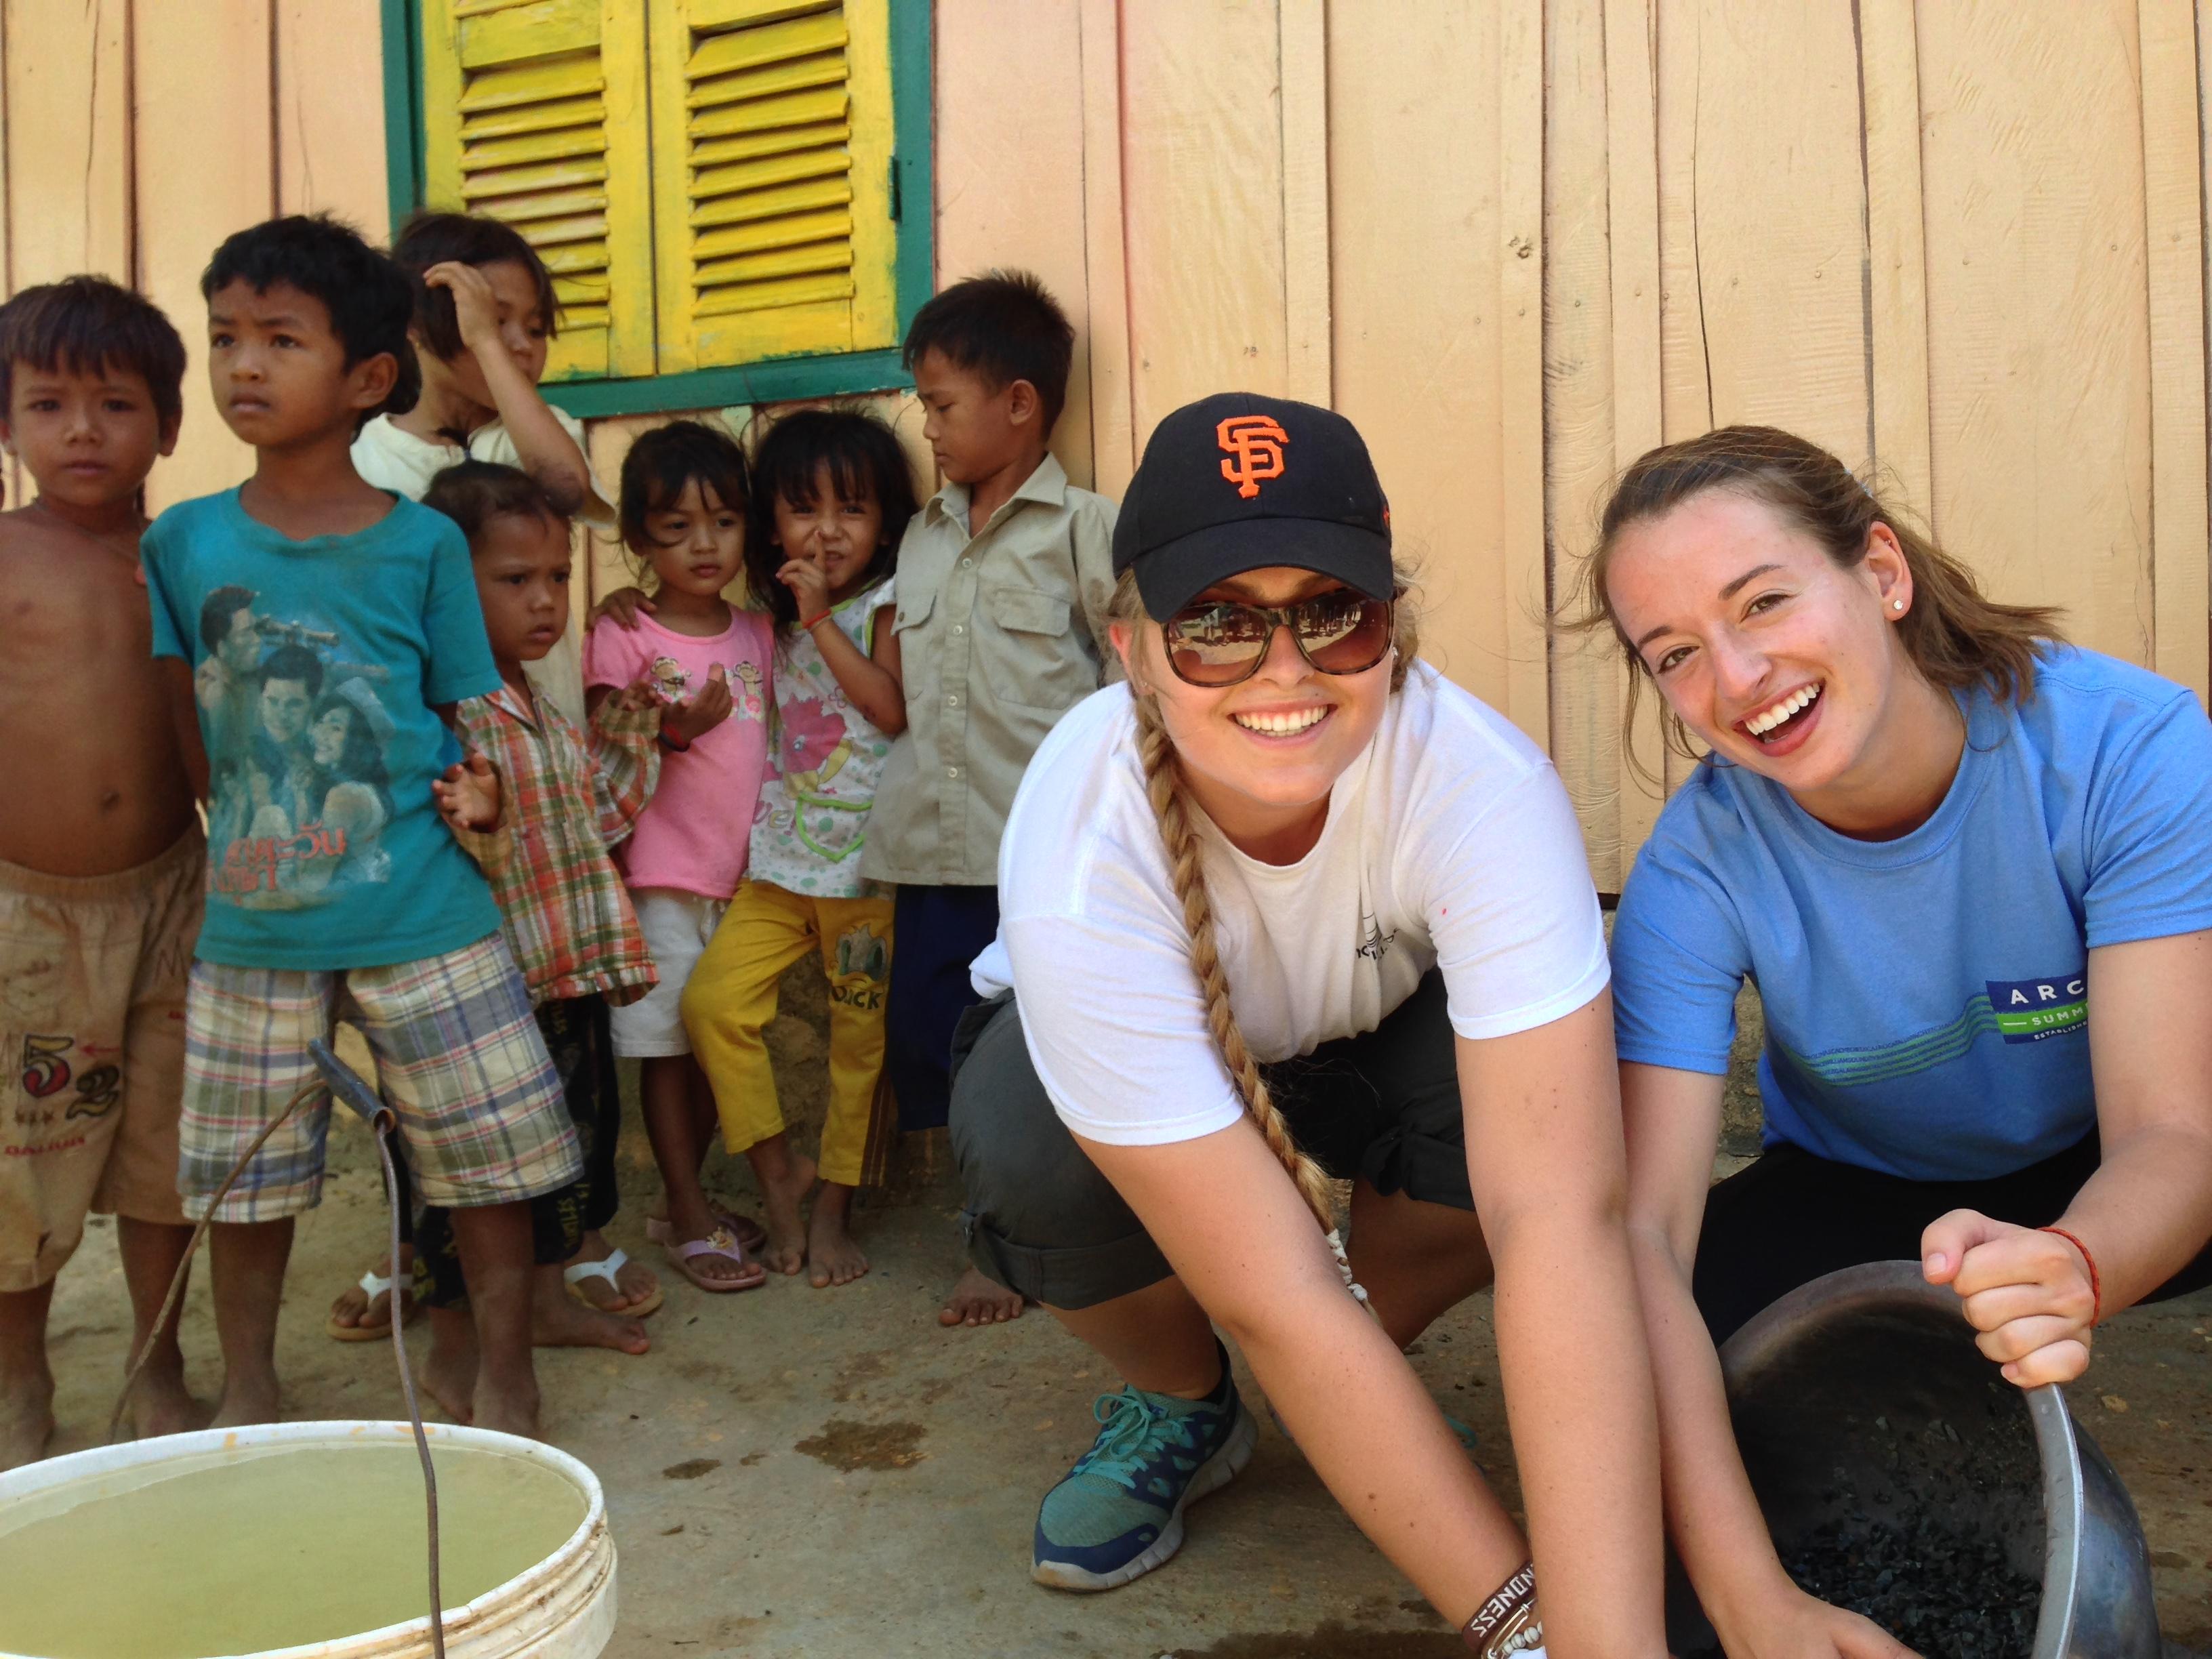 Summer Program - Animals/Nature   ARCC Programs   Vietnam & Cambodia: Project Clean Water